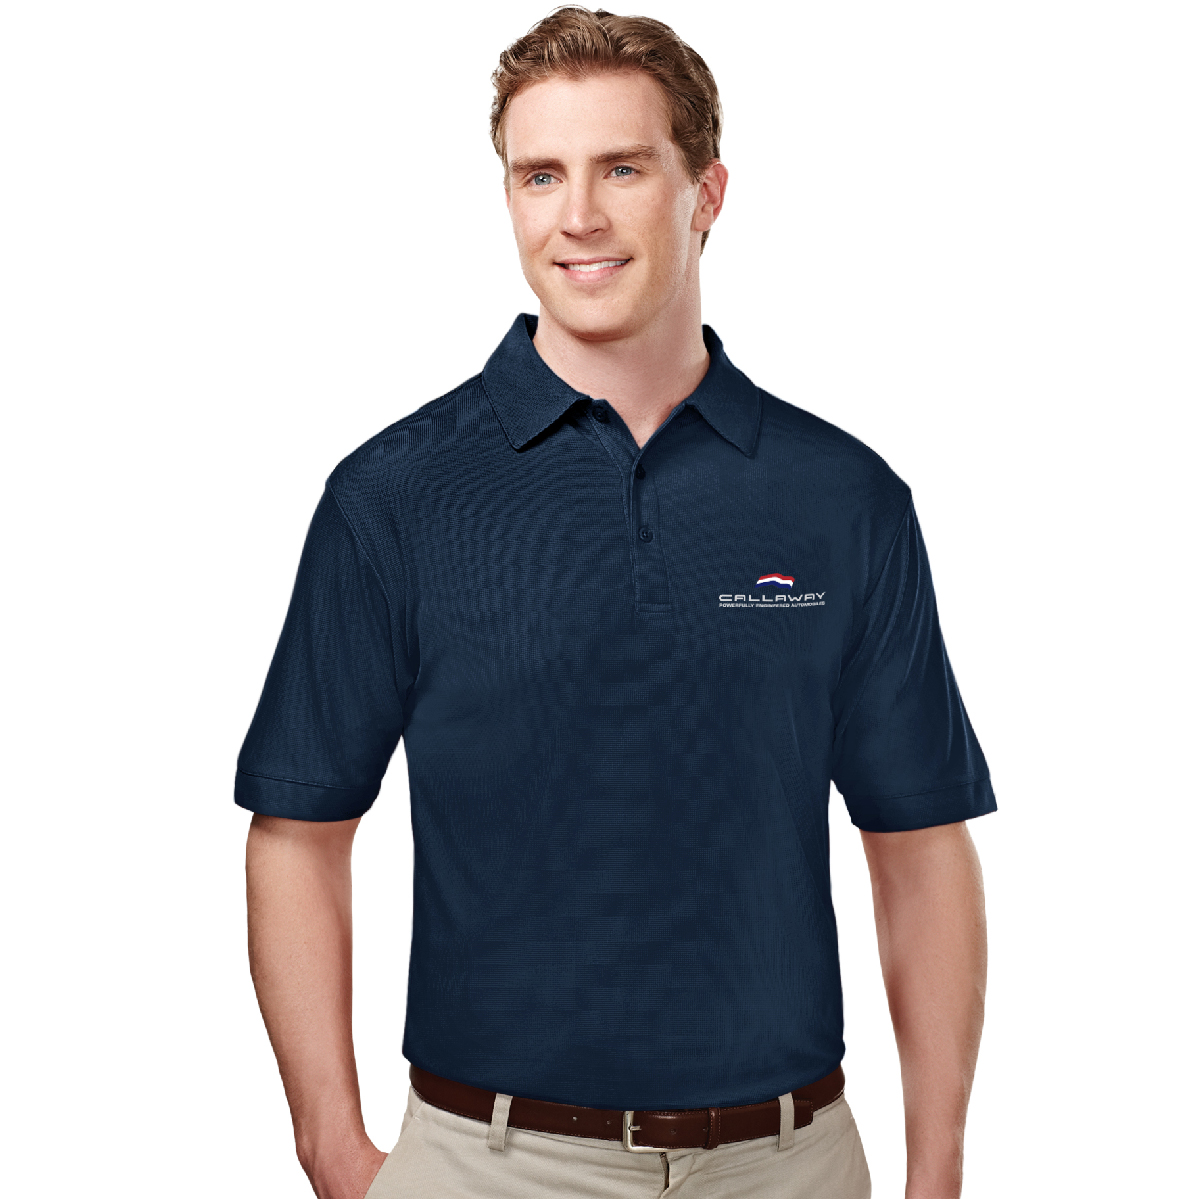 Callaway Cars Polo Shirt, Navy Blue